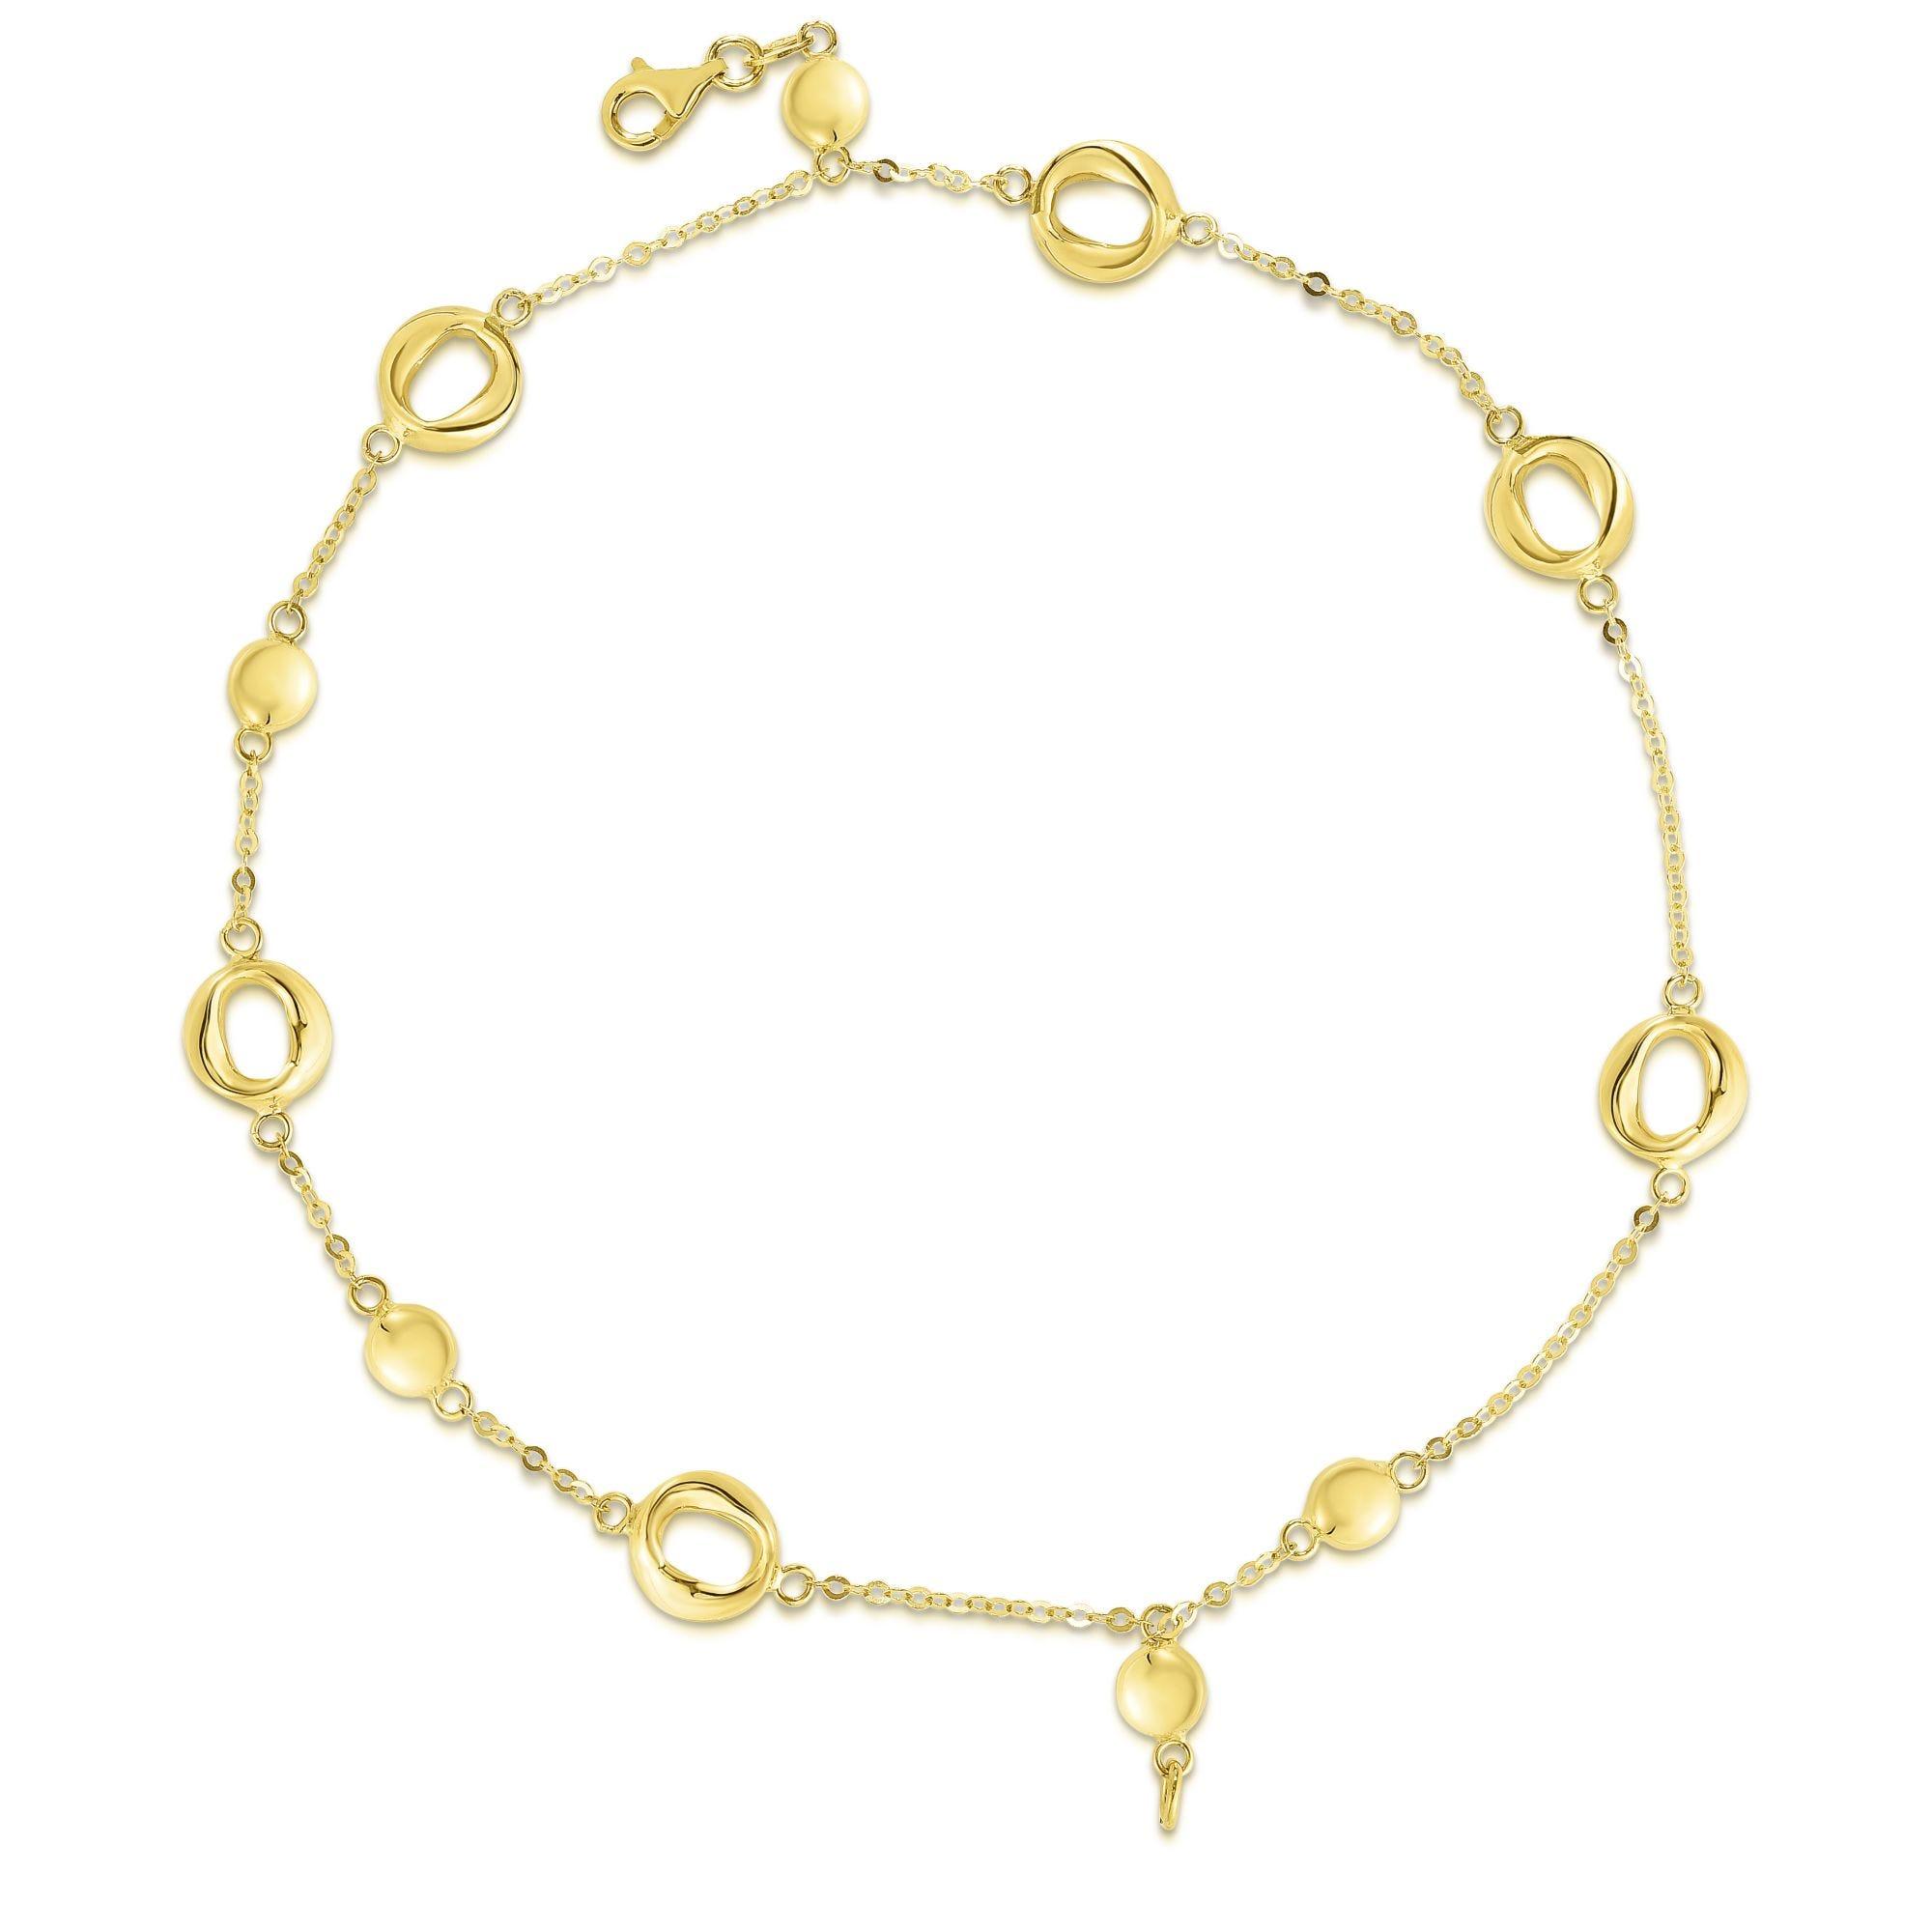 Open Circle Double-Strand Fashion Bracelet in 14k Yellow Gold